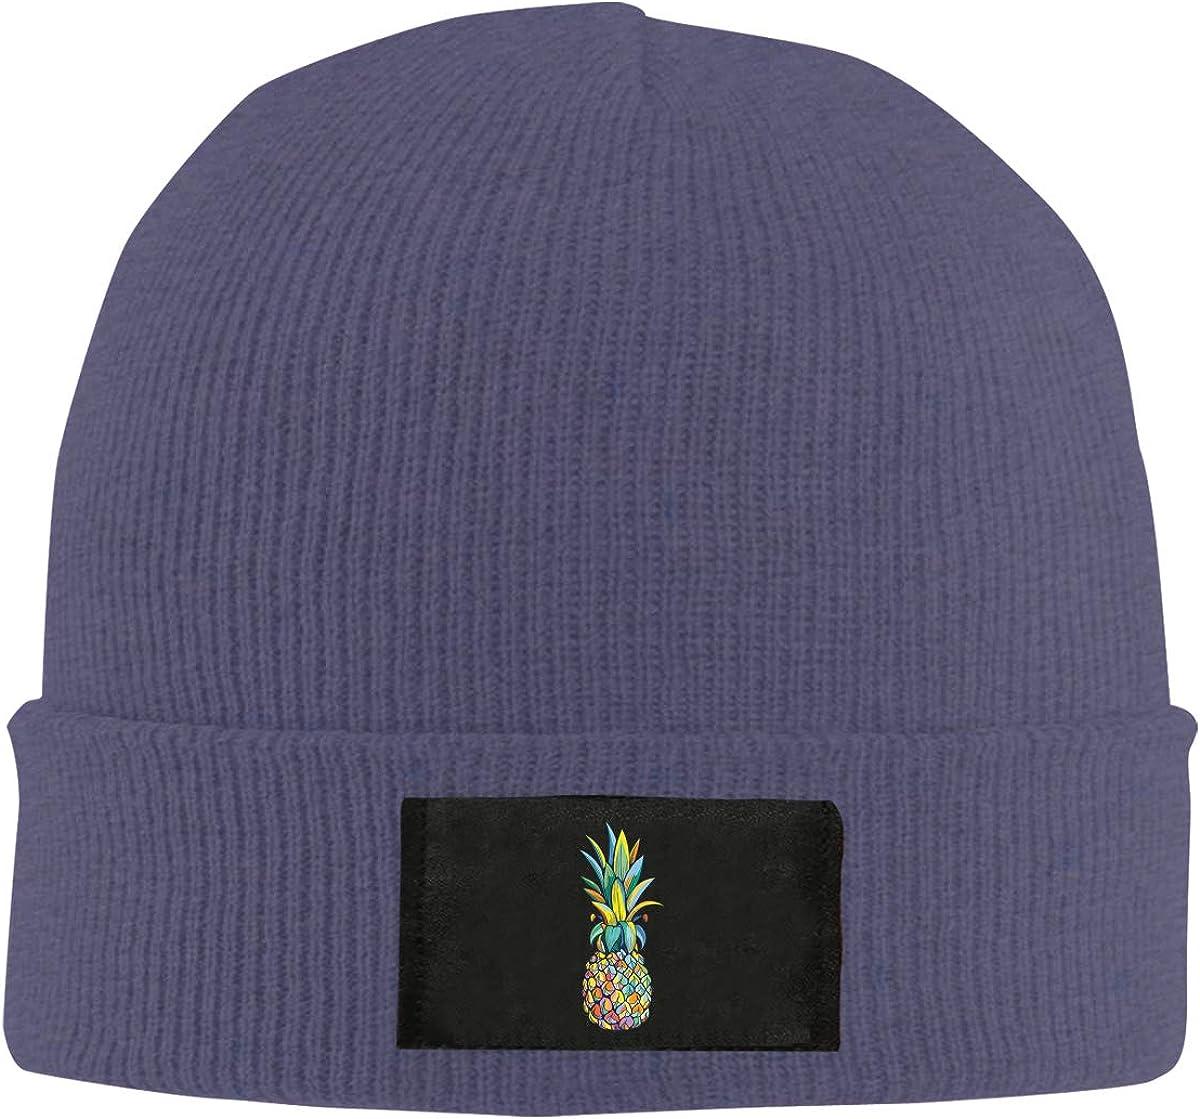 Unisex Stylish Slouch Beanie Hats Black Colorful Pineapple Top Level Beanie Men Women